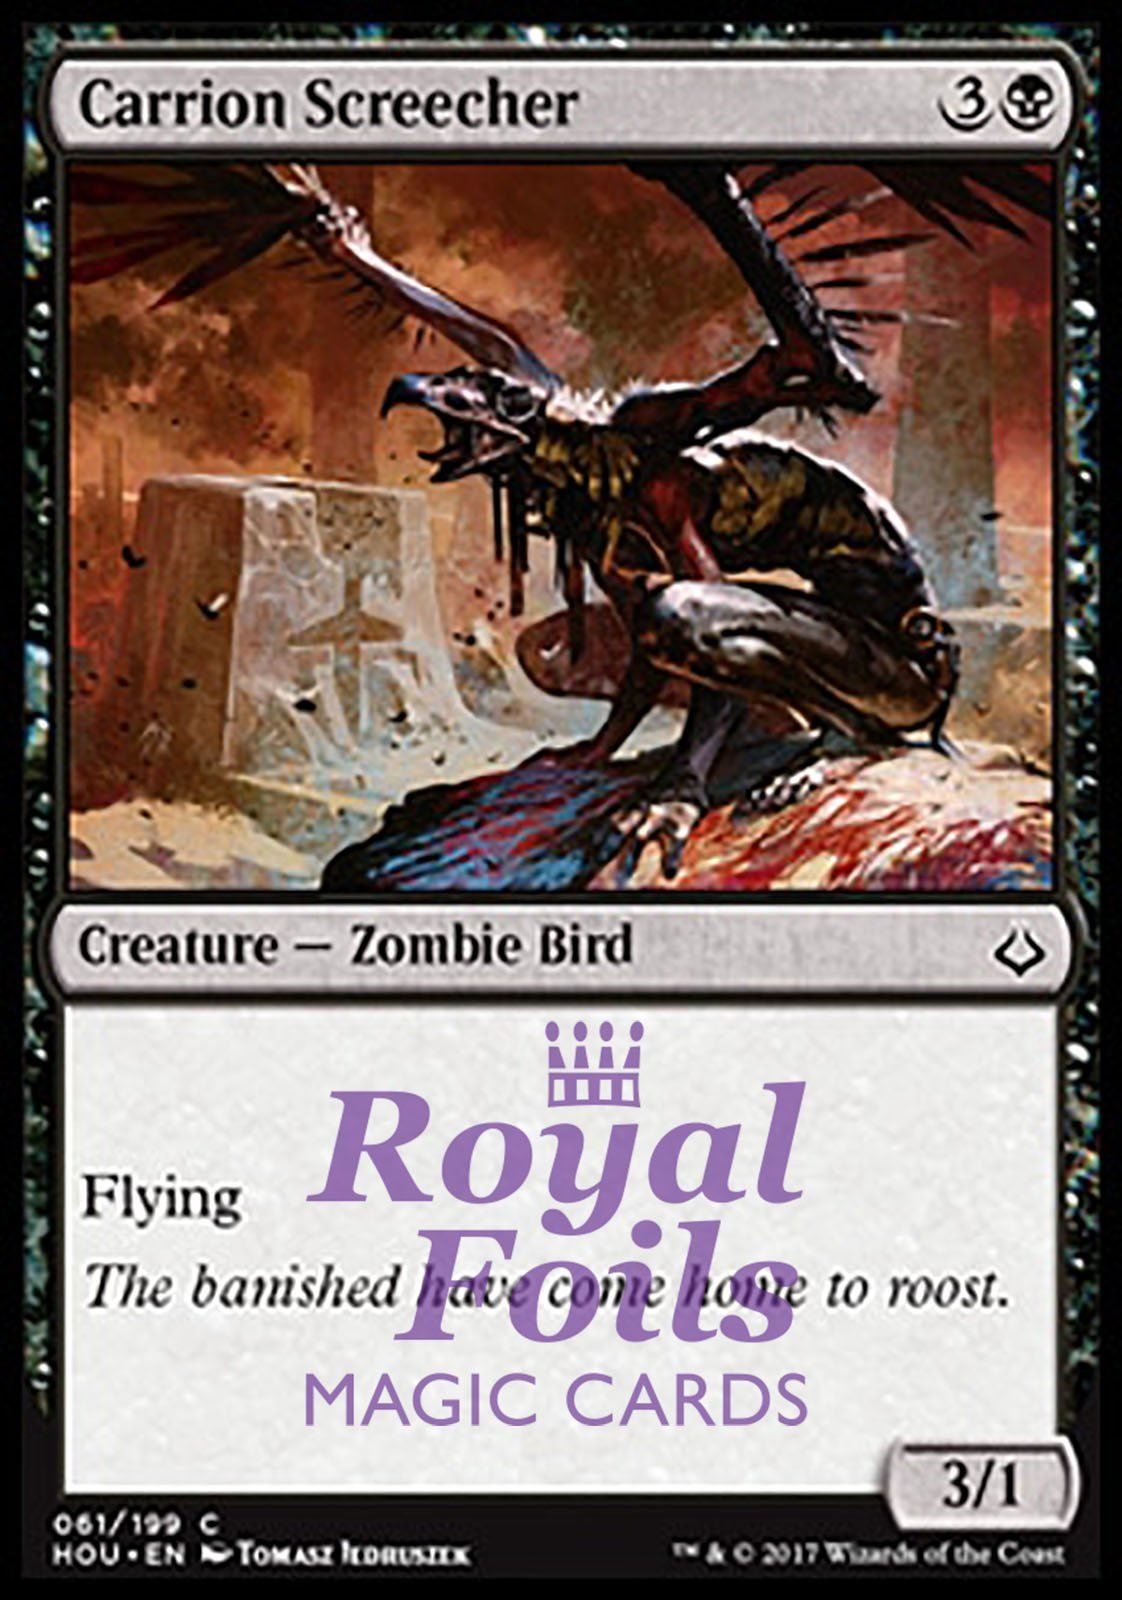 1 FOIL Reiver Demon kaartspellen Verzamelingen Black Mirrodin Mtg Magic Rare 1x x1